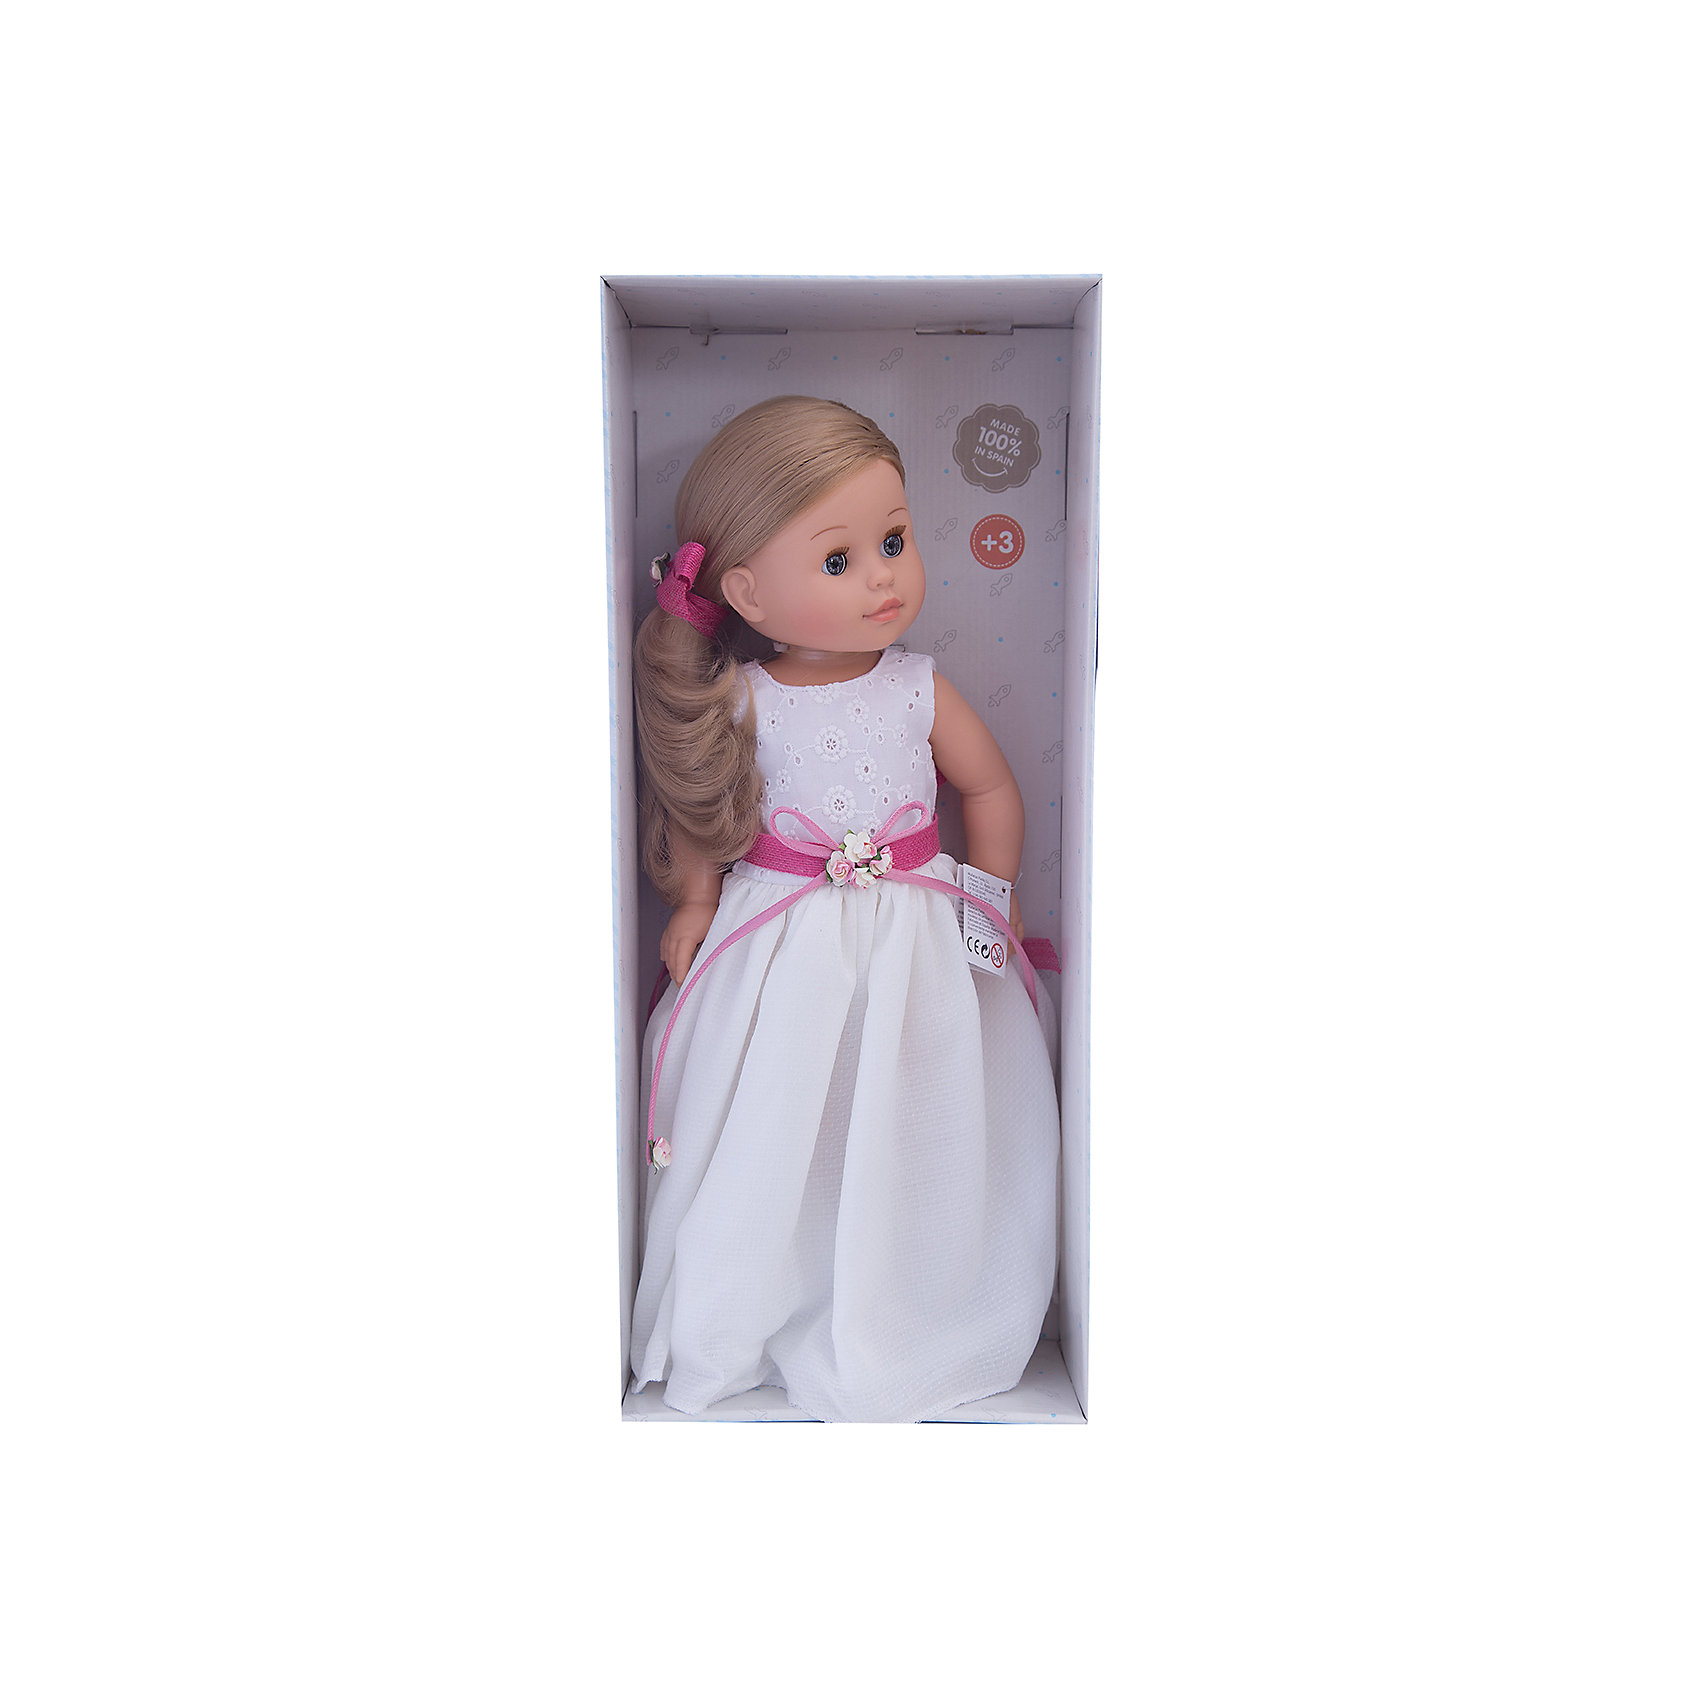 Paola Reina Кукла Эмма, 42 см, Paola Reina paola reina кукла амор 42 см paola reina